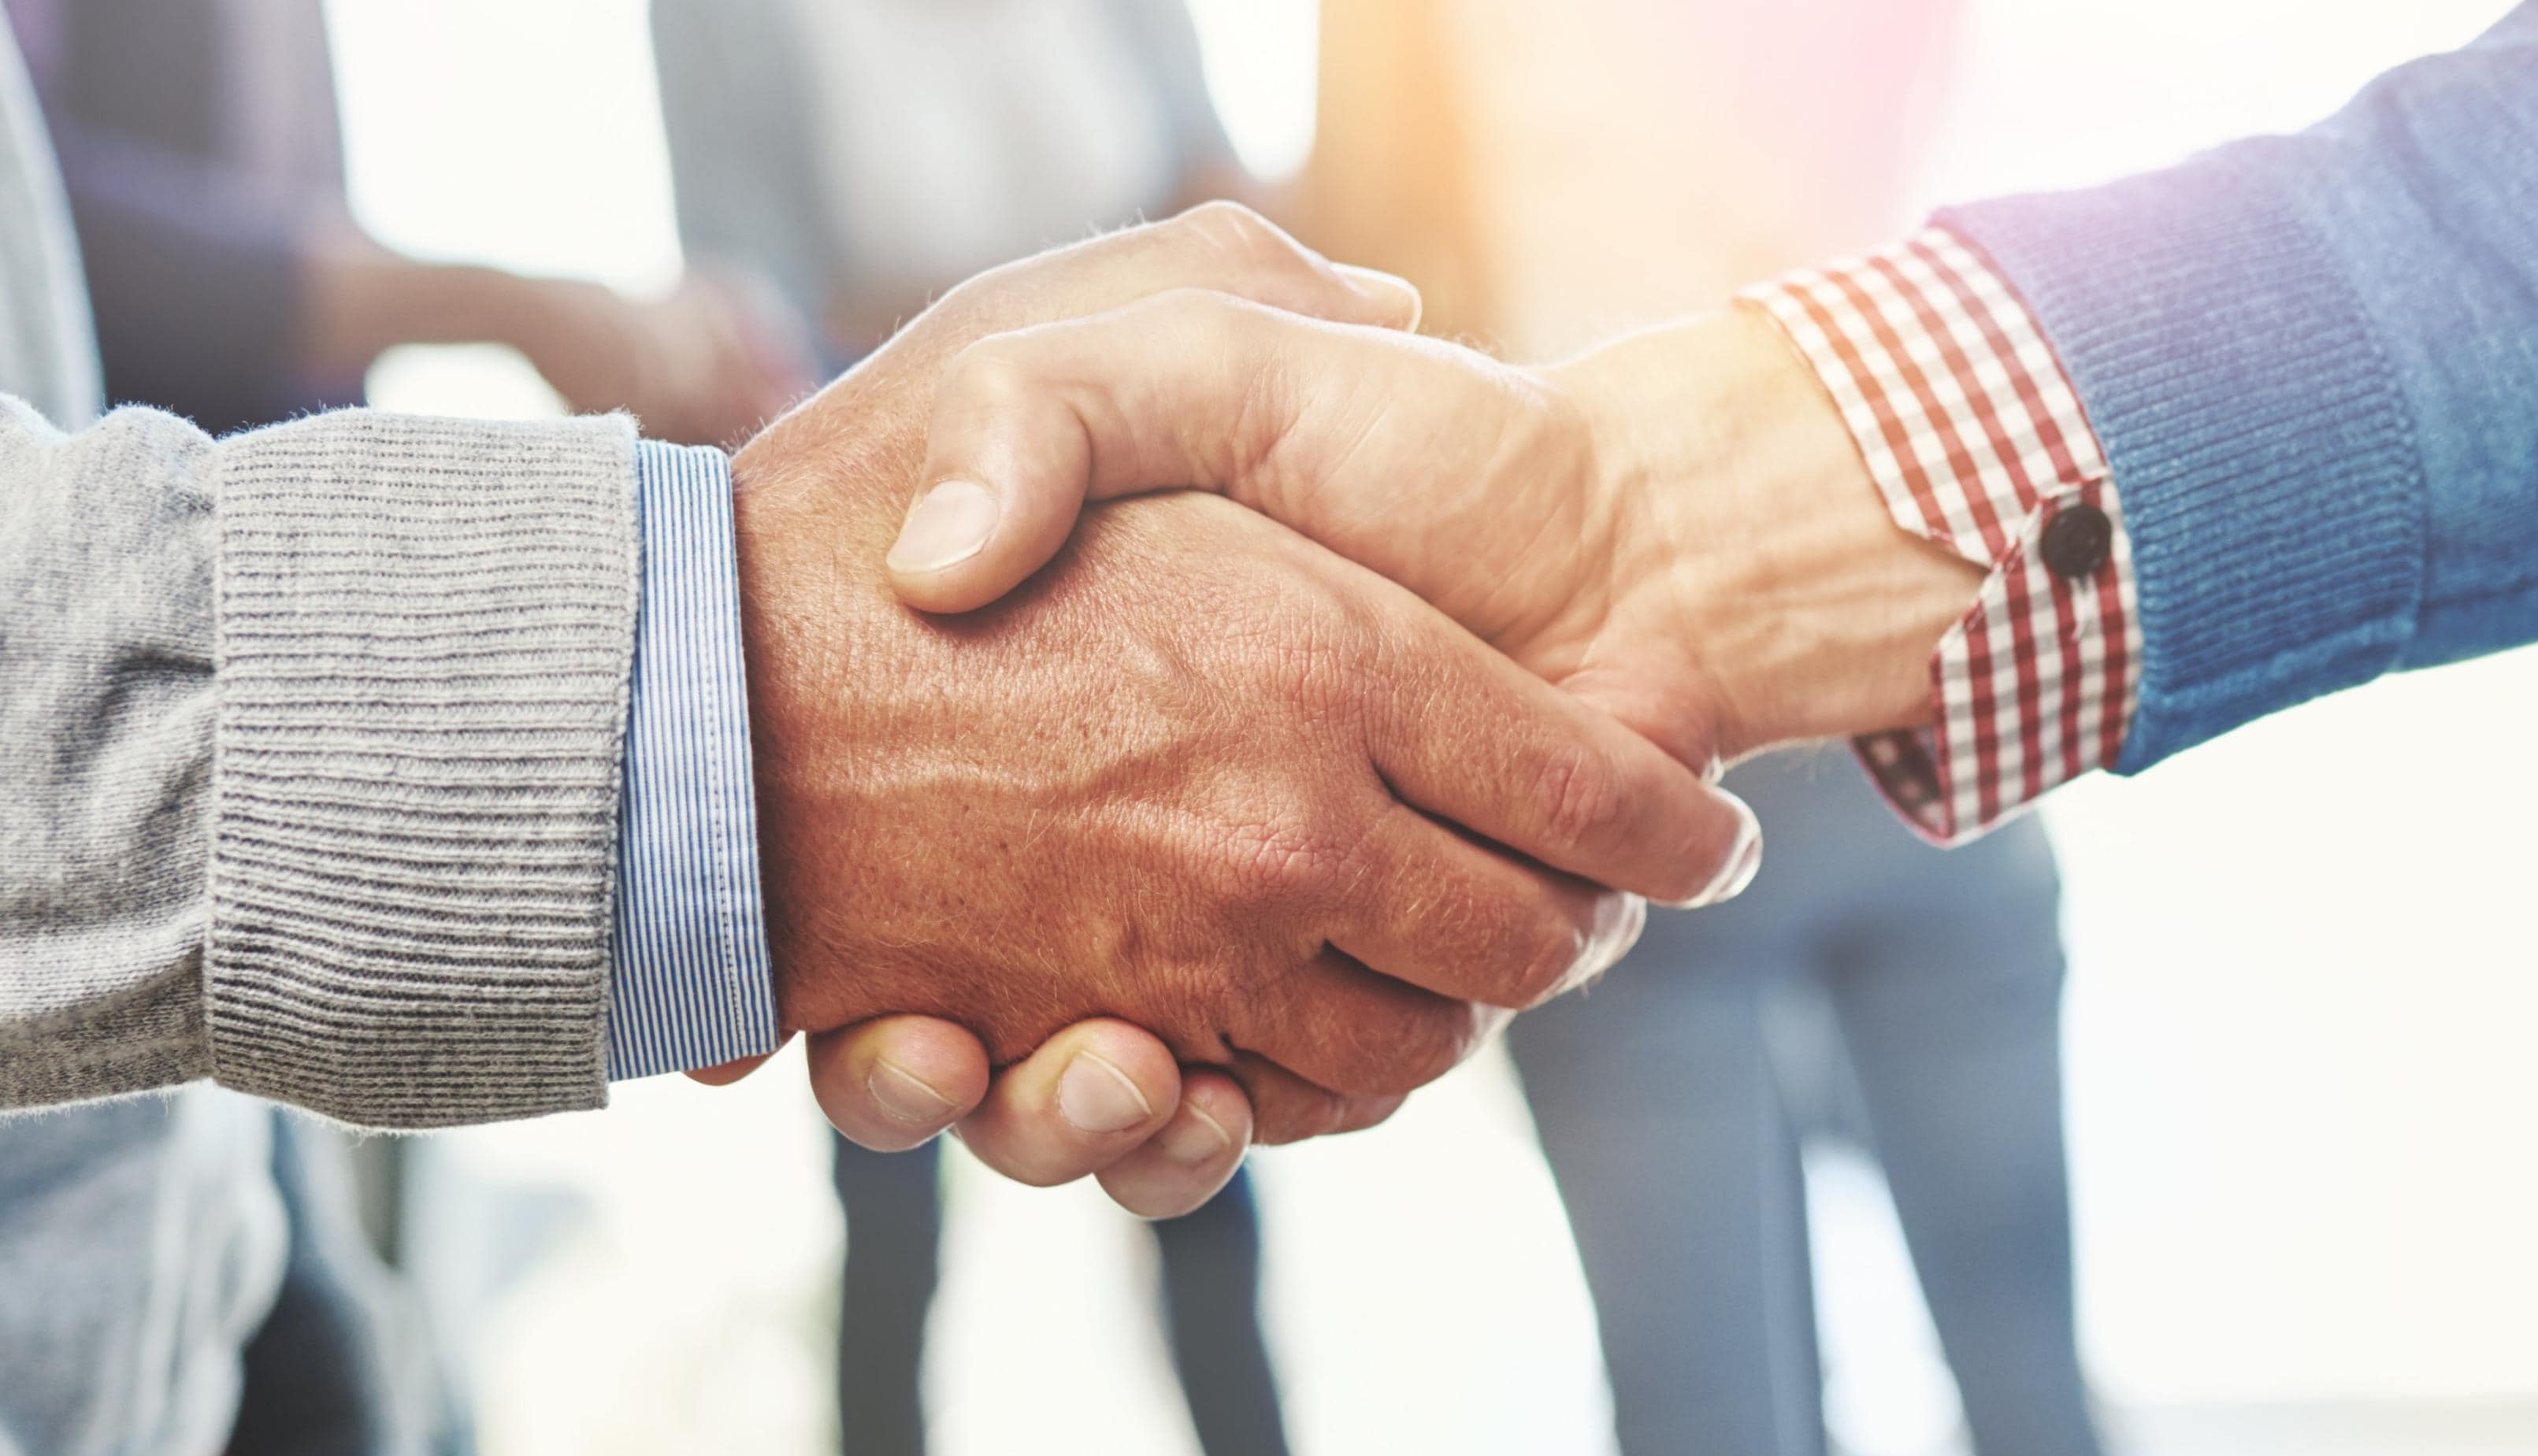 handshake_agreement_business